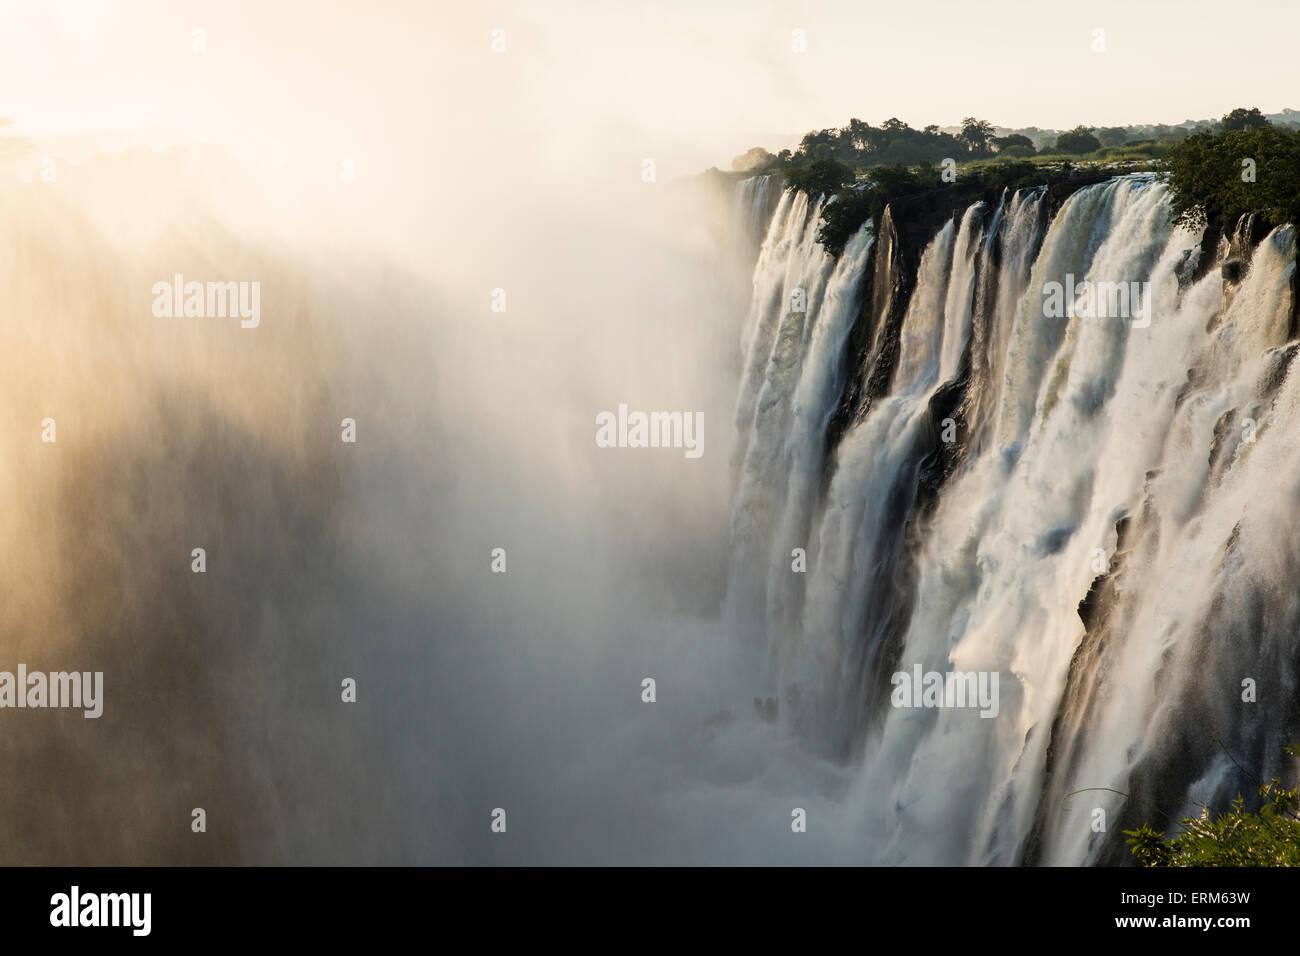 Africa, Zambia, Mosi-Oa-Tunya National Park,  Setting sun lights Eastern Cataract of Victoria Falls - Stock Image